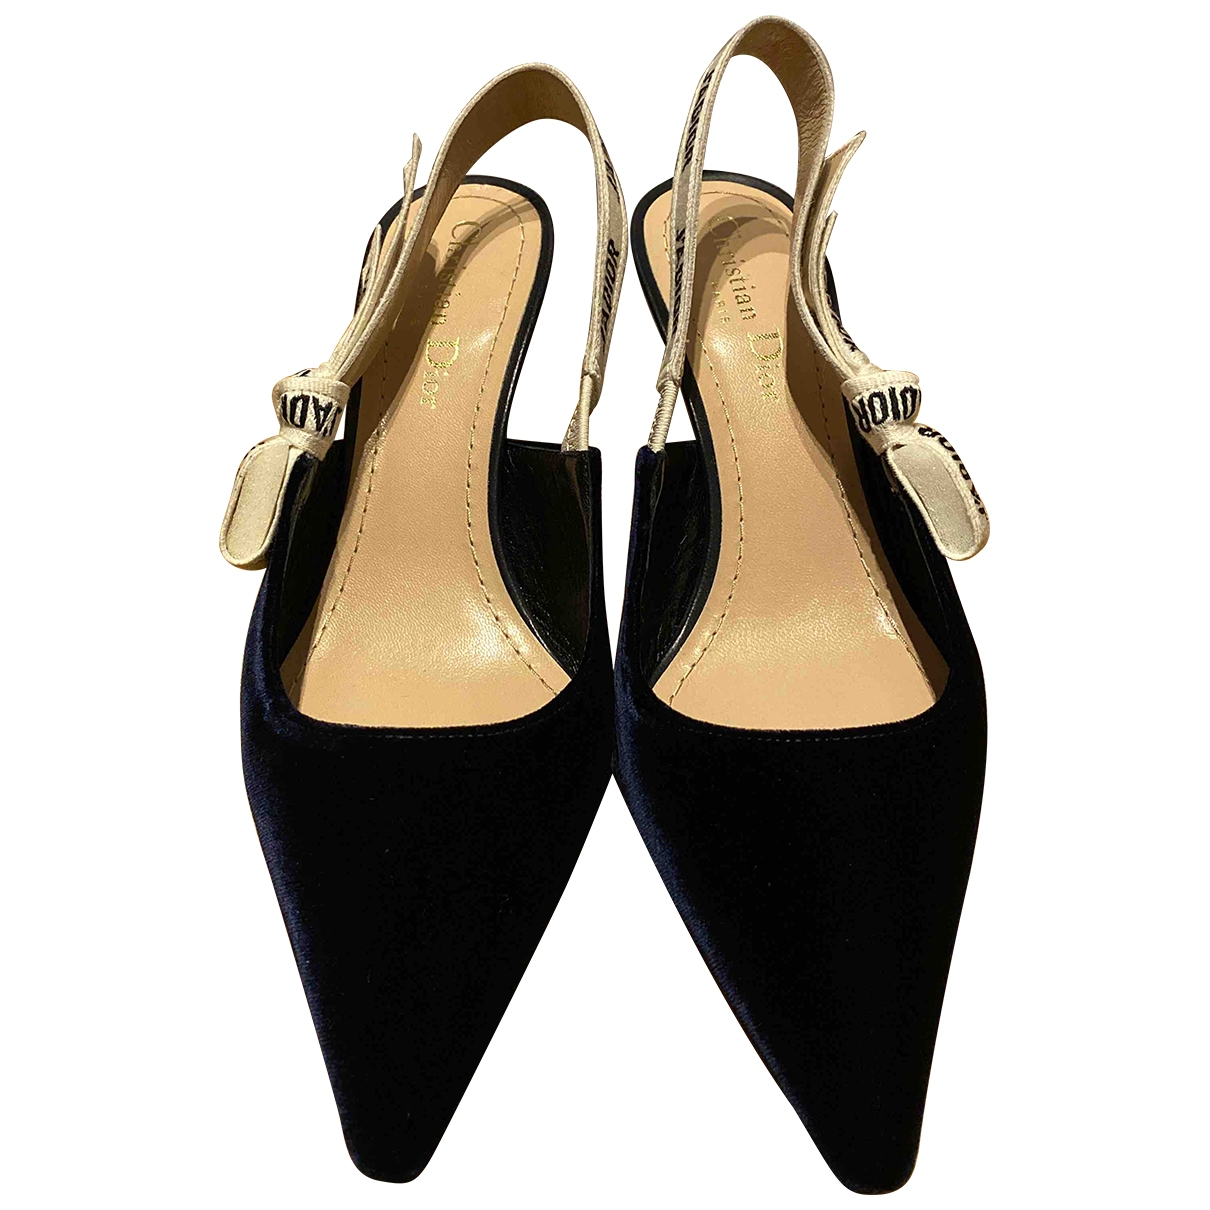 Dior - Escarpins Jadior pour femme en velours - bleu